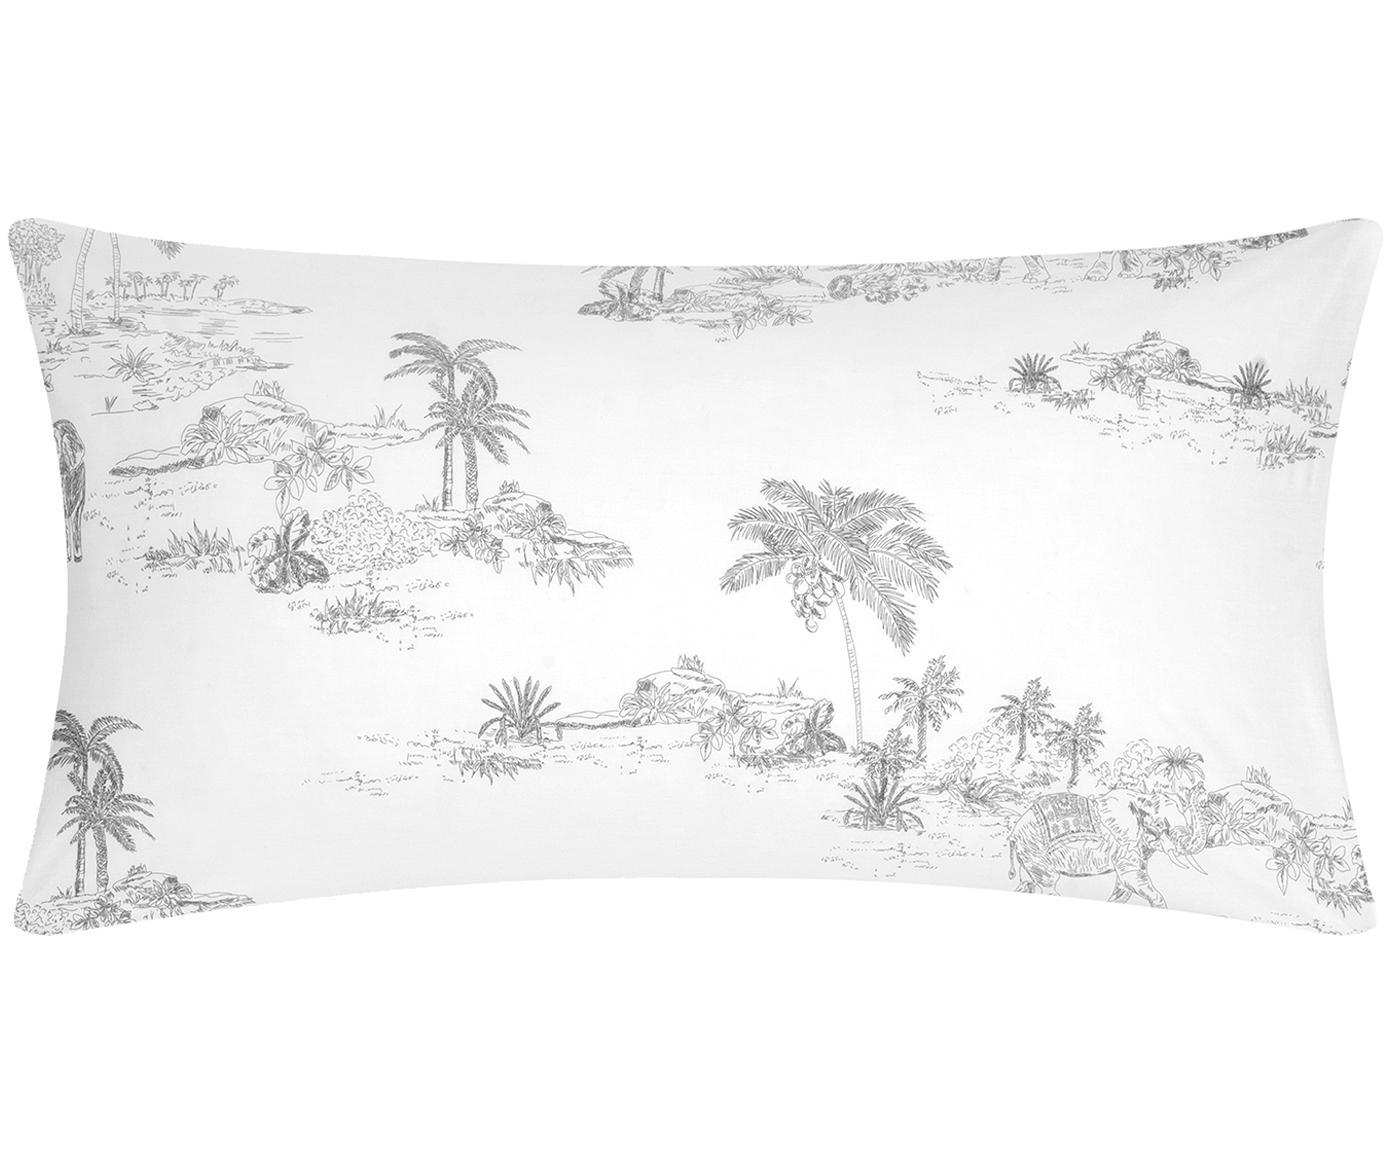 Baumwollperkal-Kissenbezüge Forest mit gezeichnetem Print, 2 Stück, Webart: Perkal Fadendichte 180 TC, Weiß, Grau, 40 x 80 cm